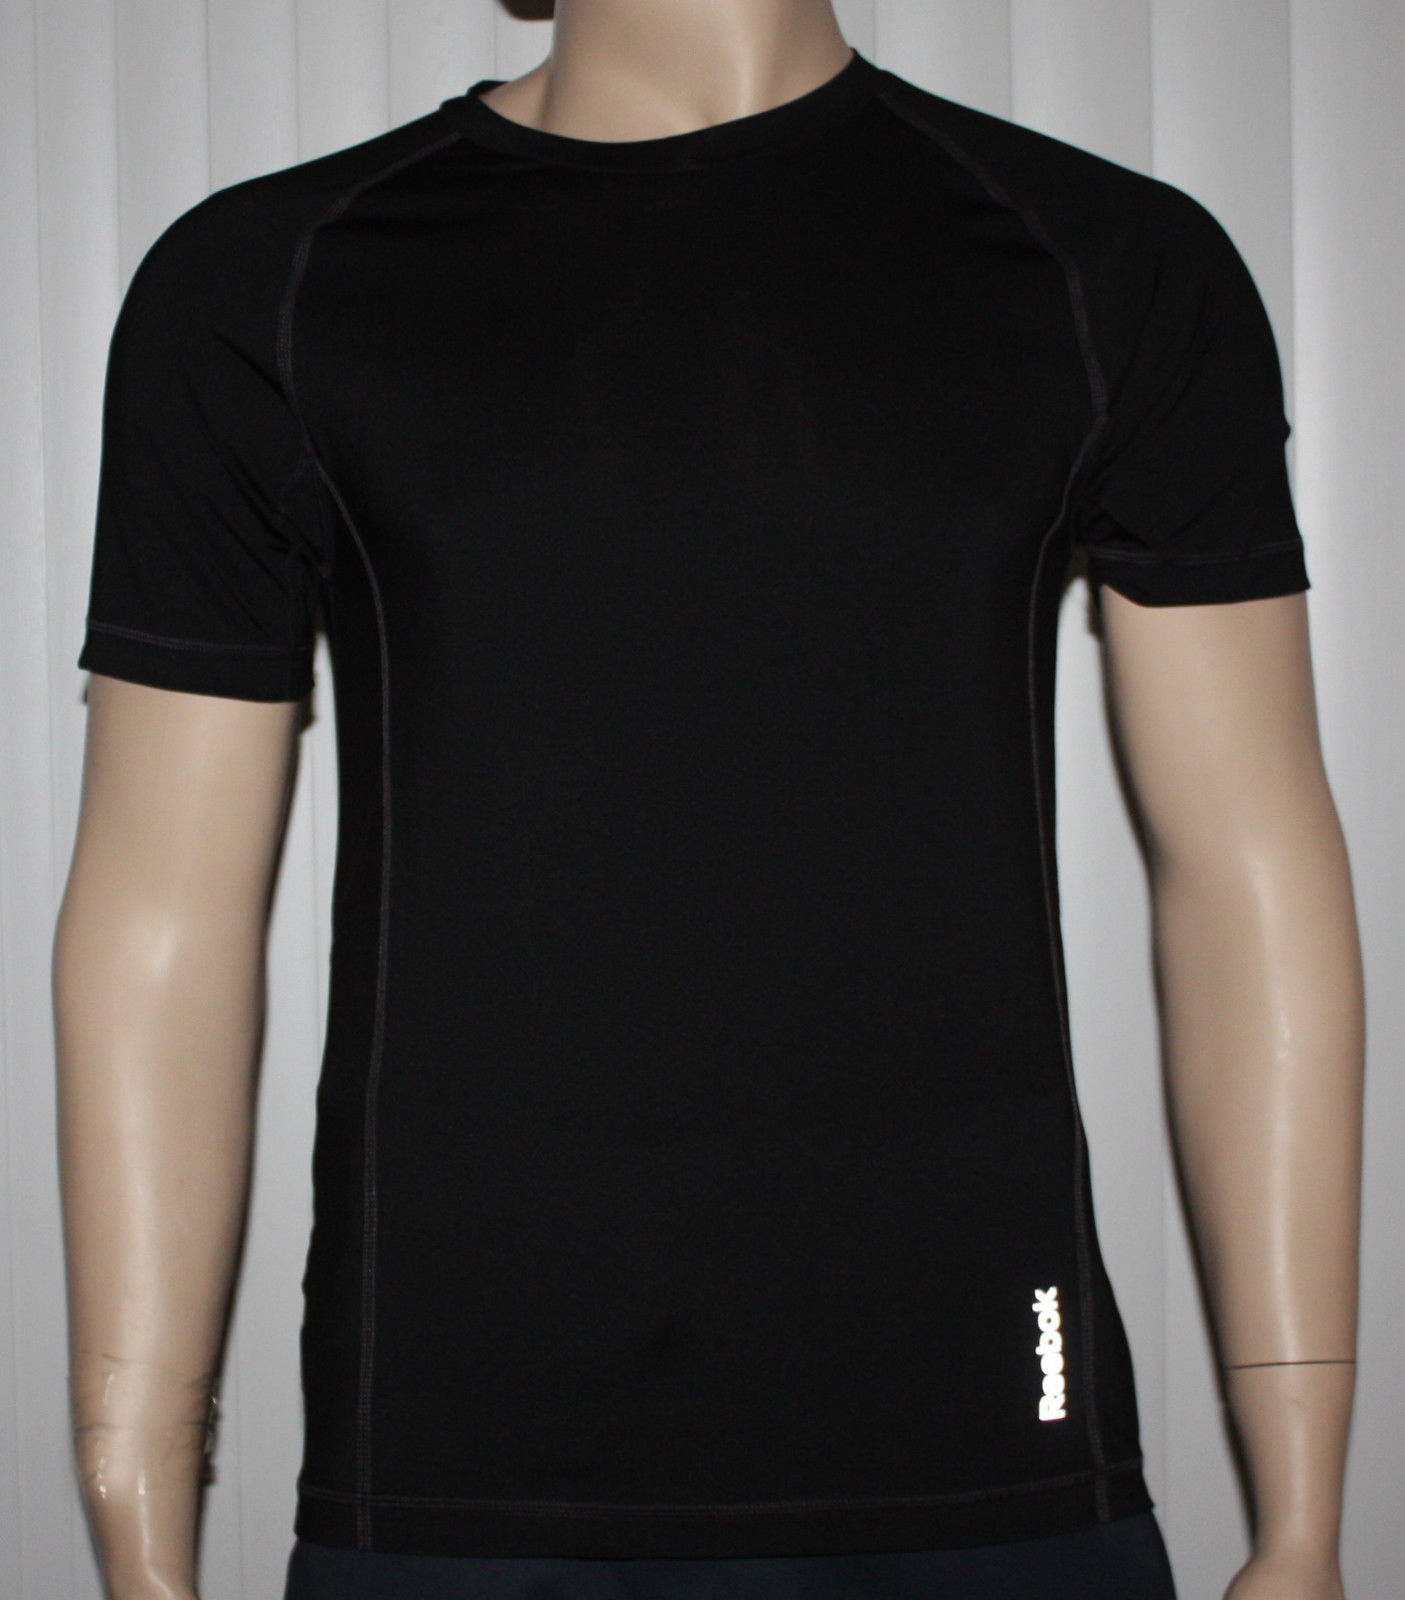 Reebok SPORT Men's Black Compression Shirt Top (Several Sizes) 10786